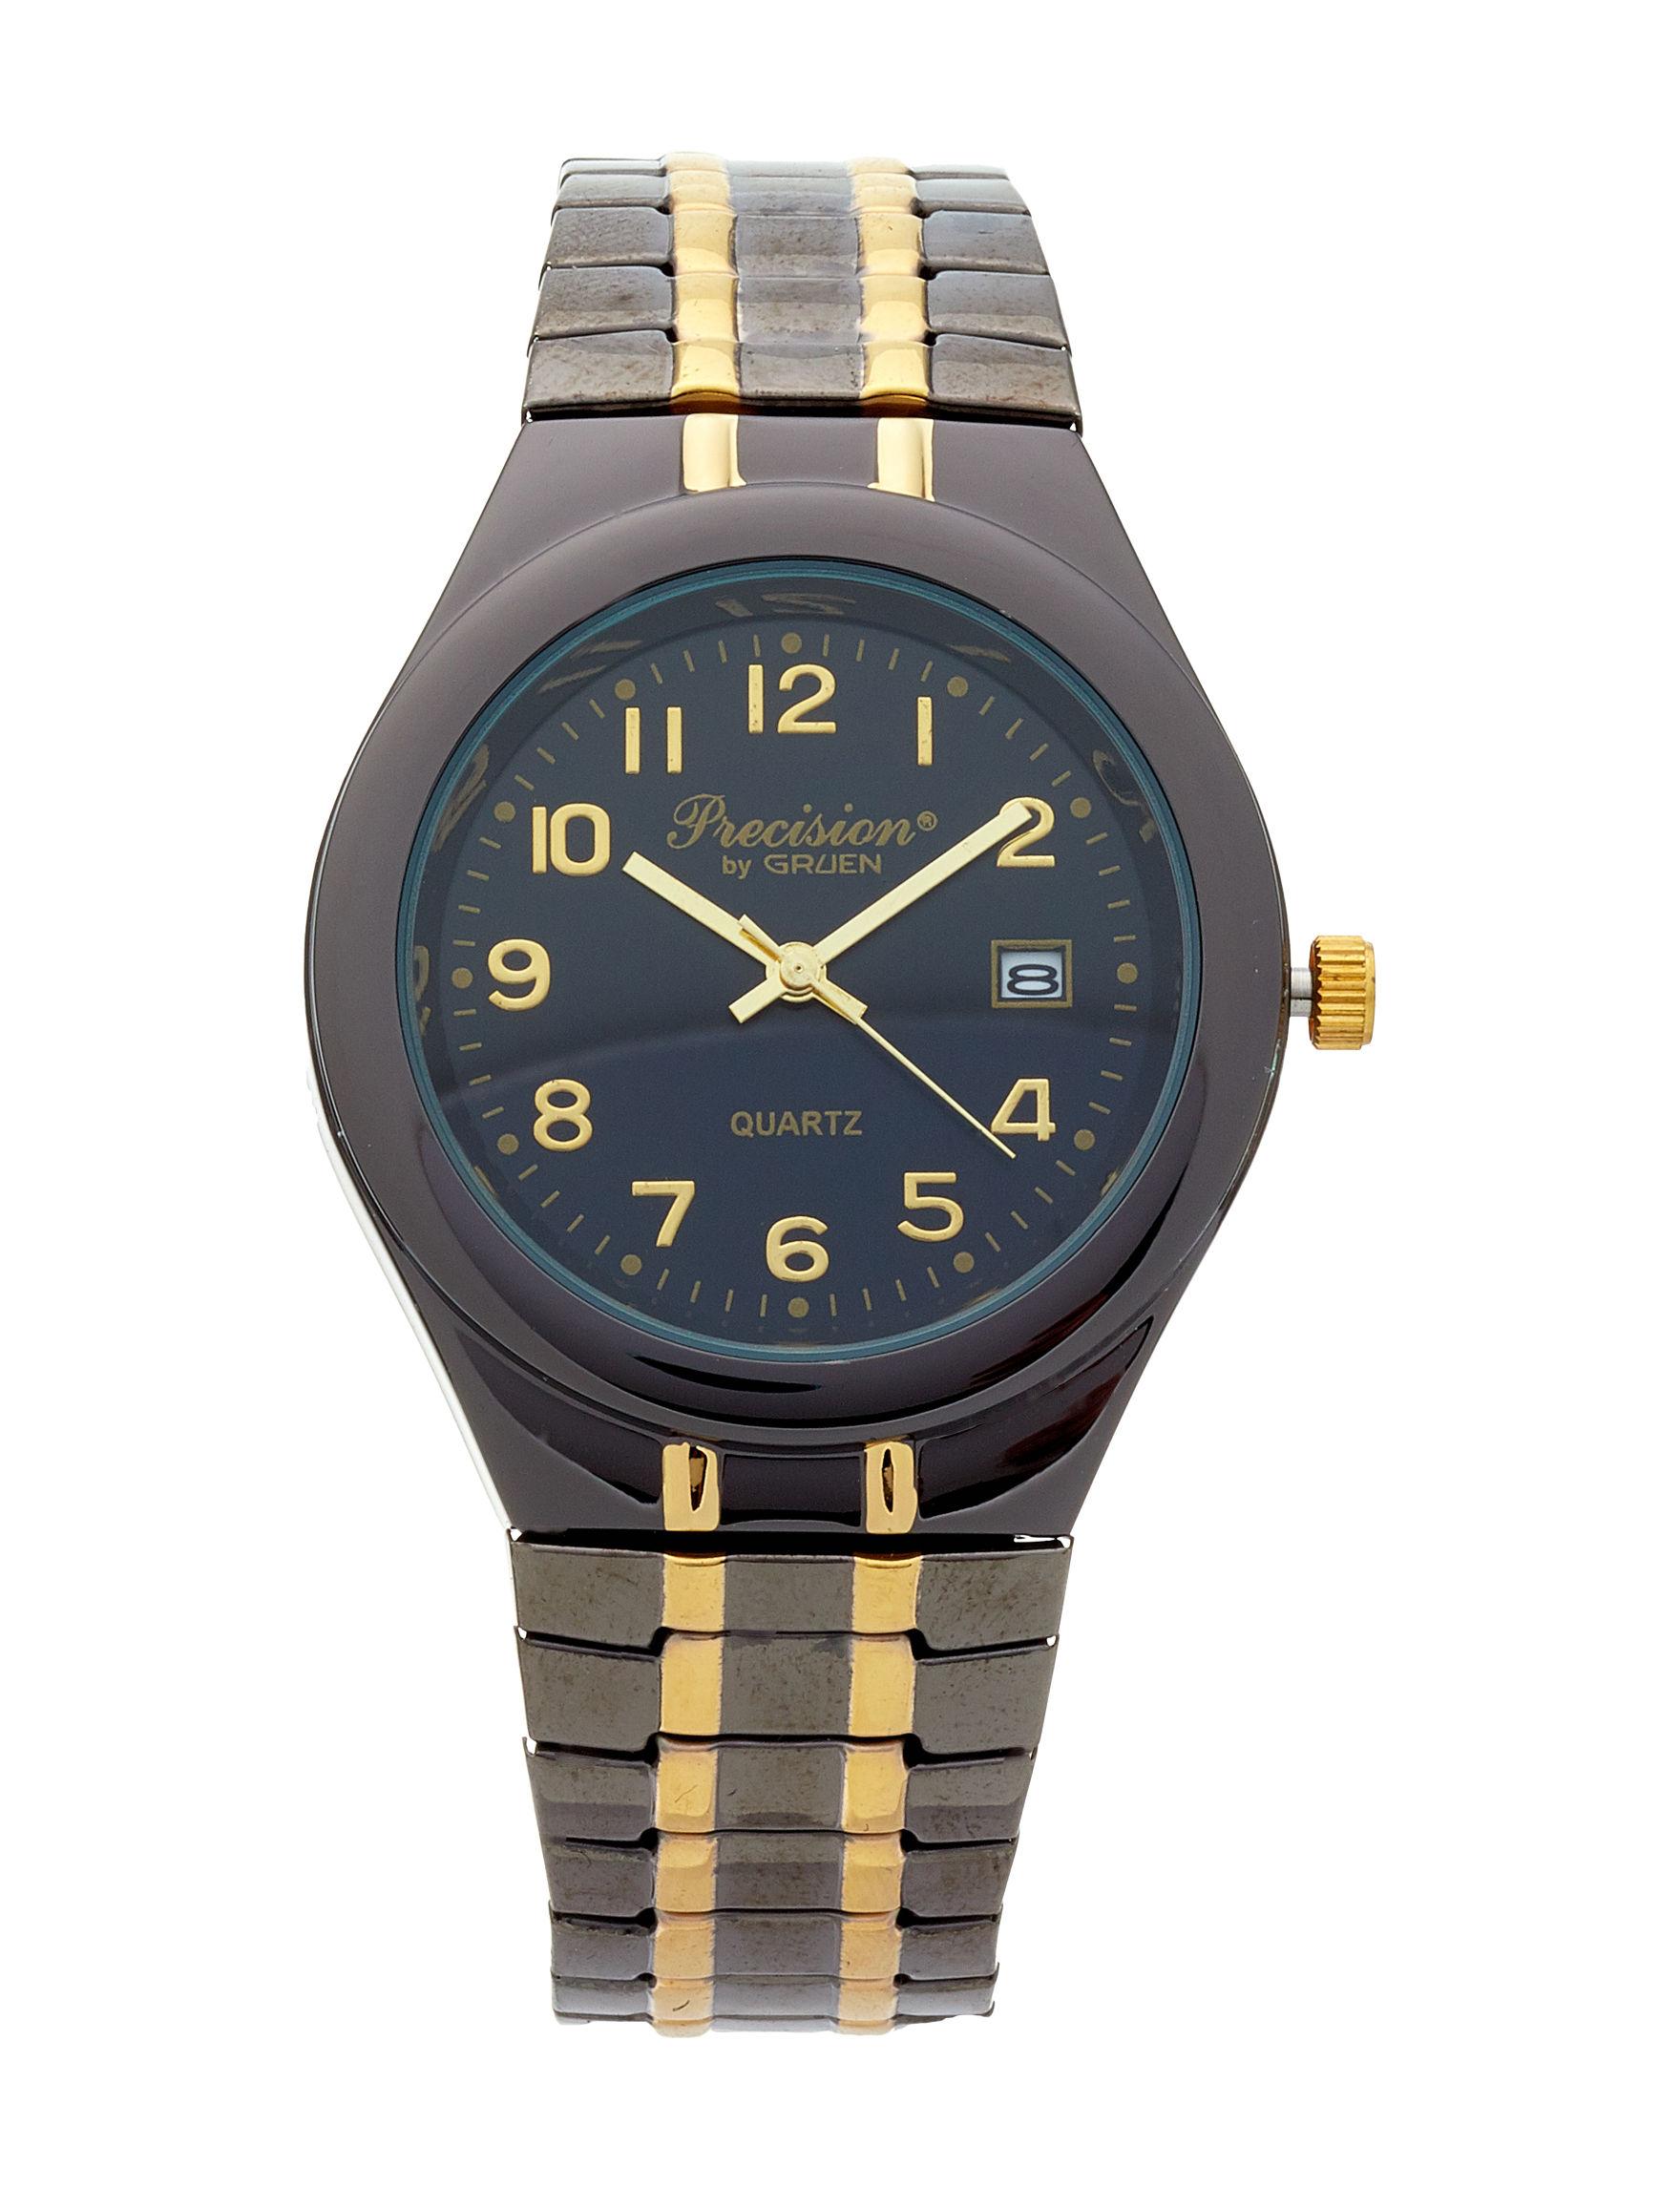 Accutime Black / Gold Fashion Watches